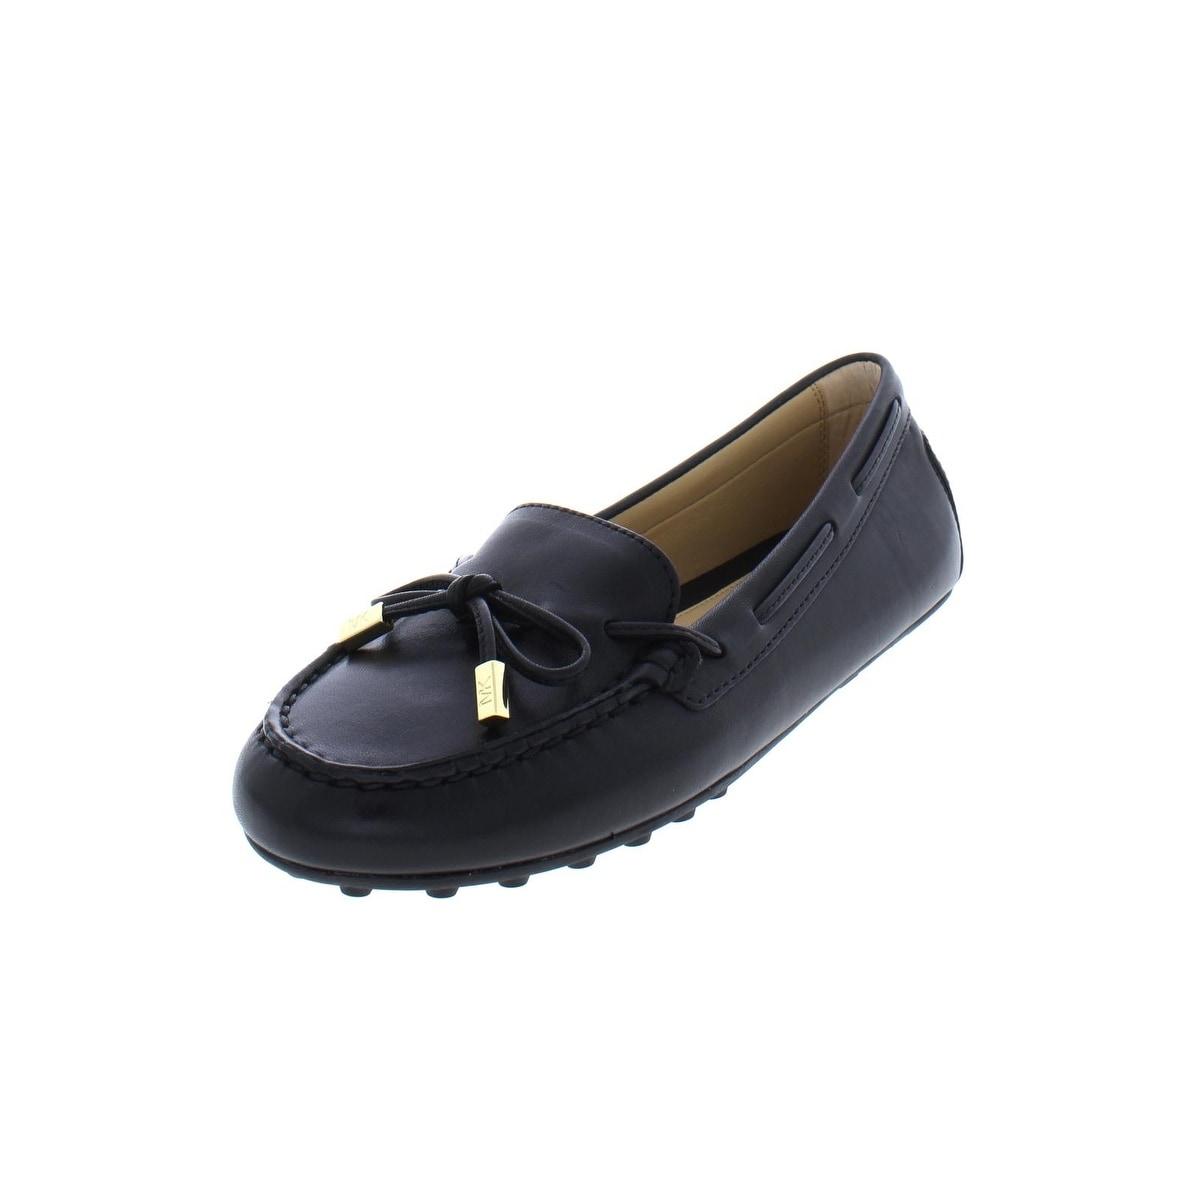 0bca8efeba8d2 MICHAEL Michael Kors Womens Daisy Moccasins Leather Flats